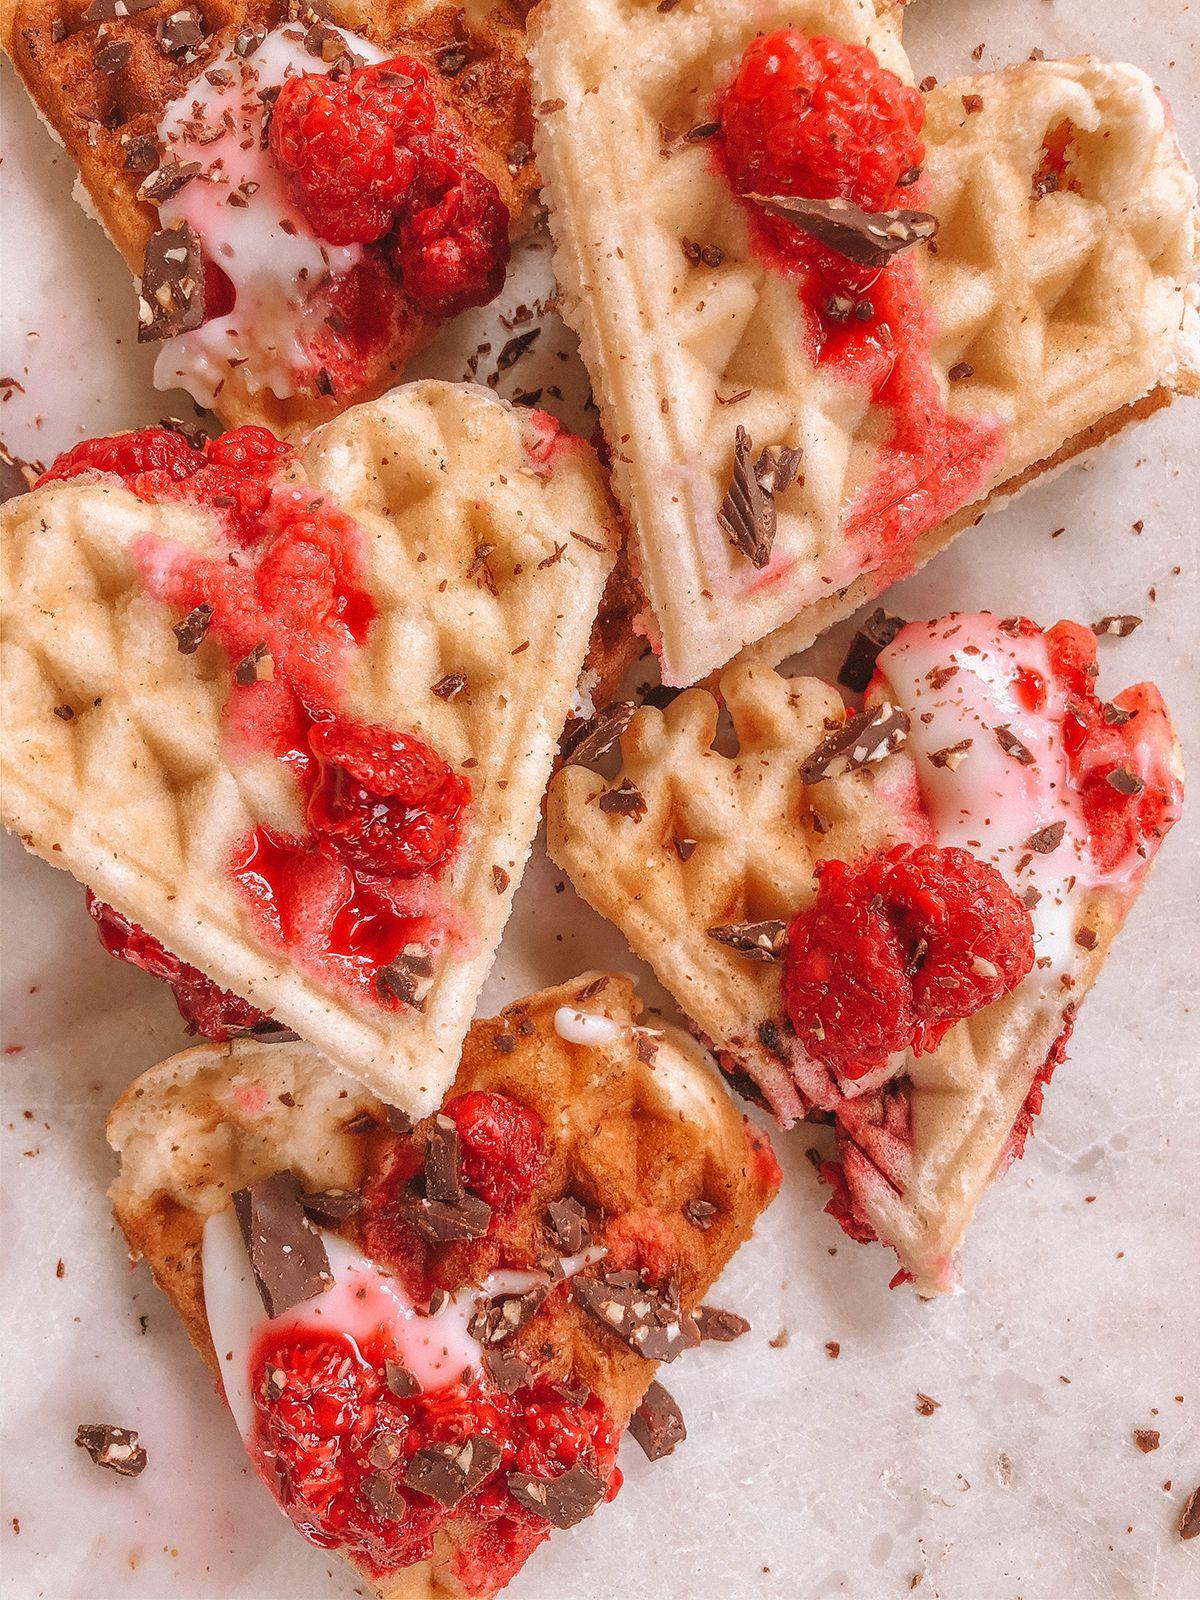 Oilfree Vegan Waffles When Sweet Becomes Healthy Recipe In 2020 Vegan Waffles Vegan Waffle Recipe Easy Oil Free Vegan